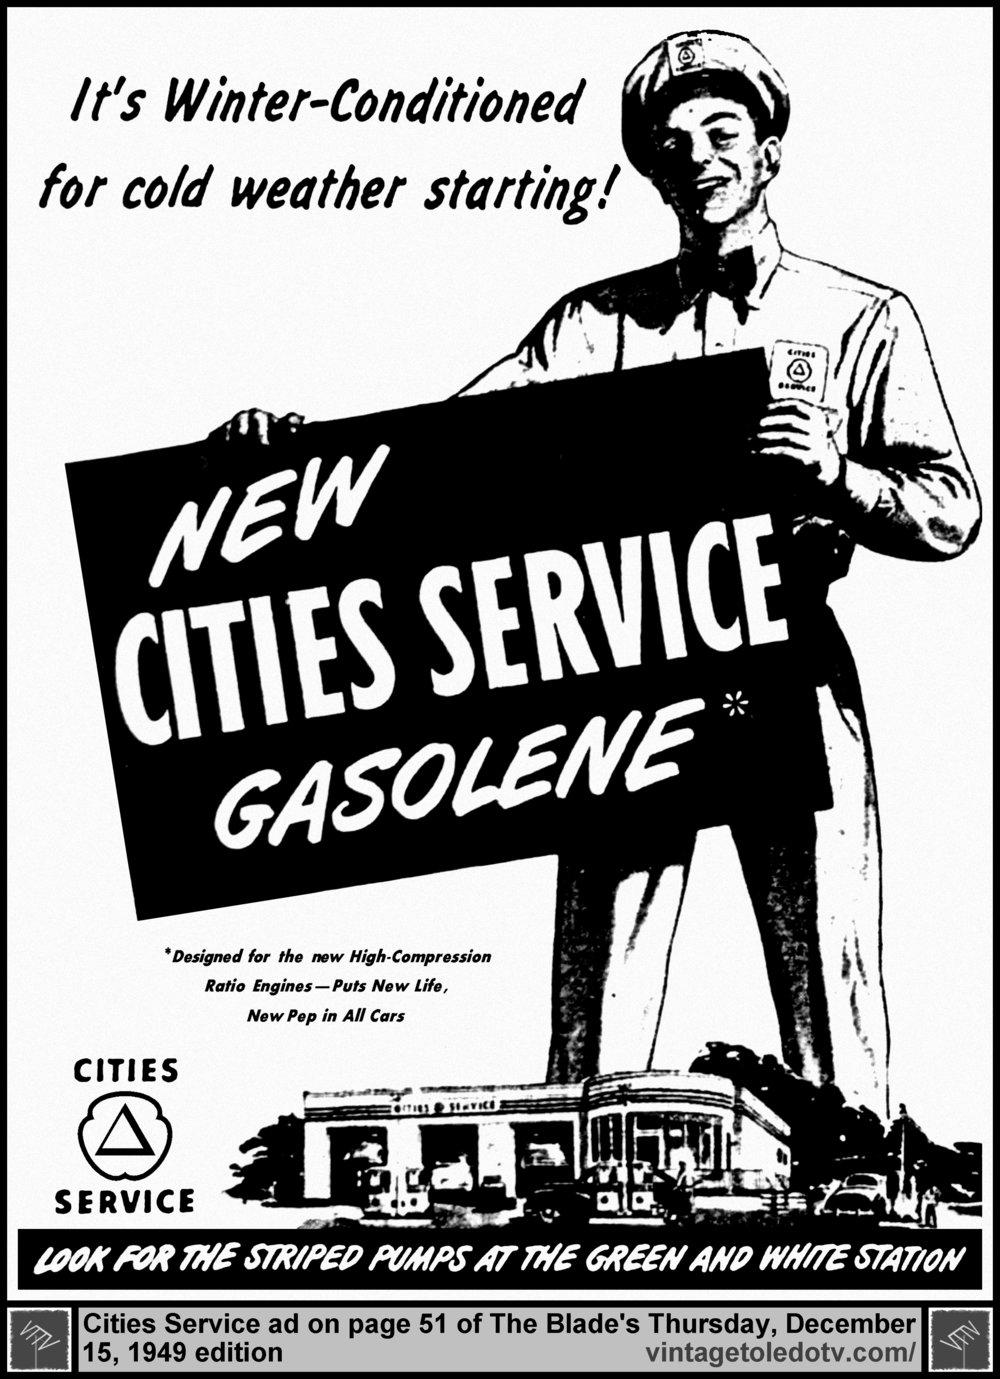 multiple image galleries 1959 Pontiac Bonneville new cities service gasolene thursday 12 15 49 ad on page 51